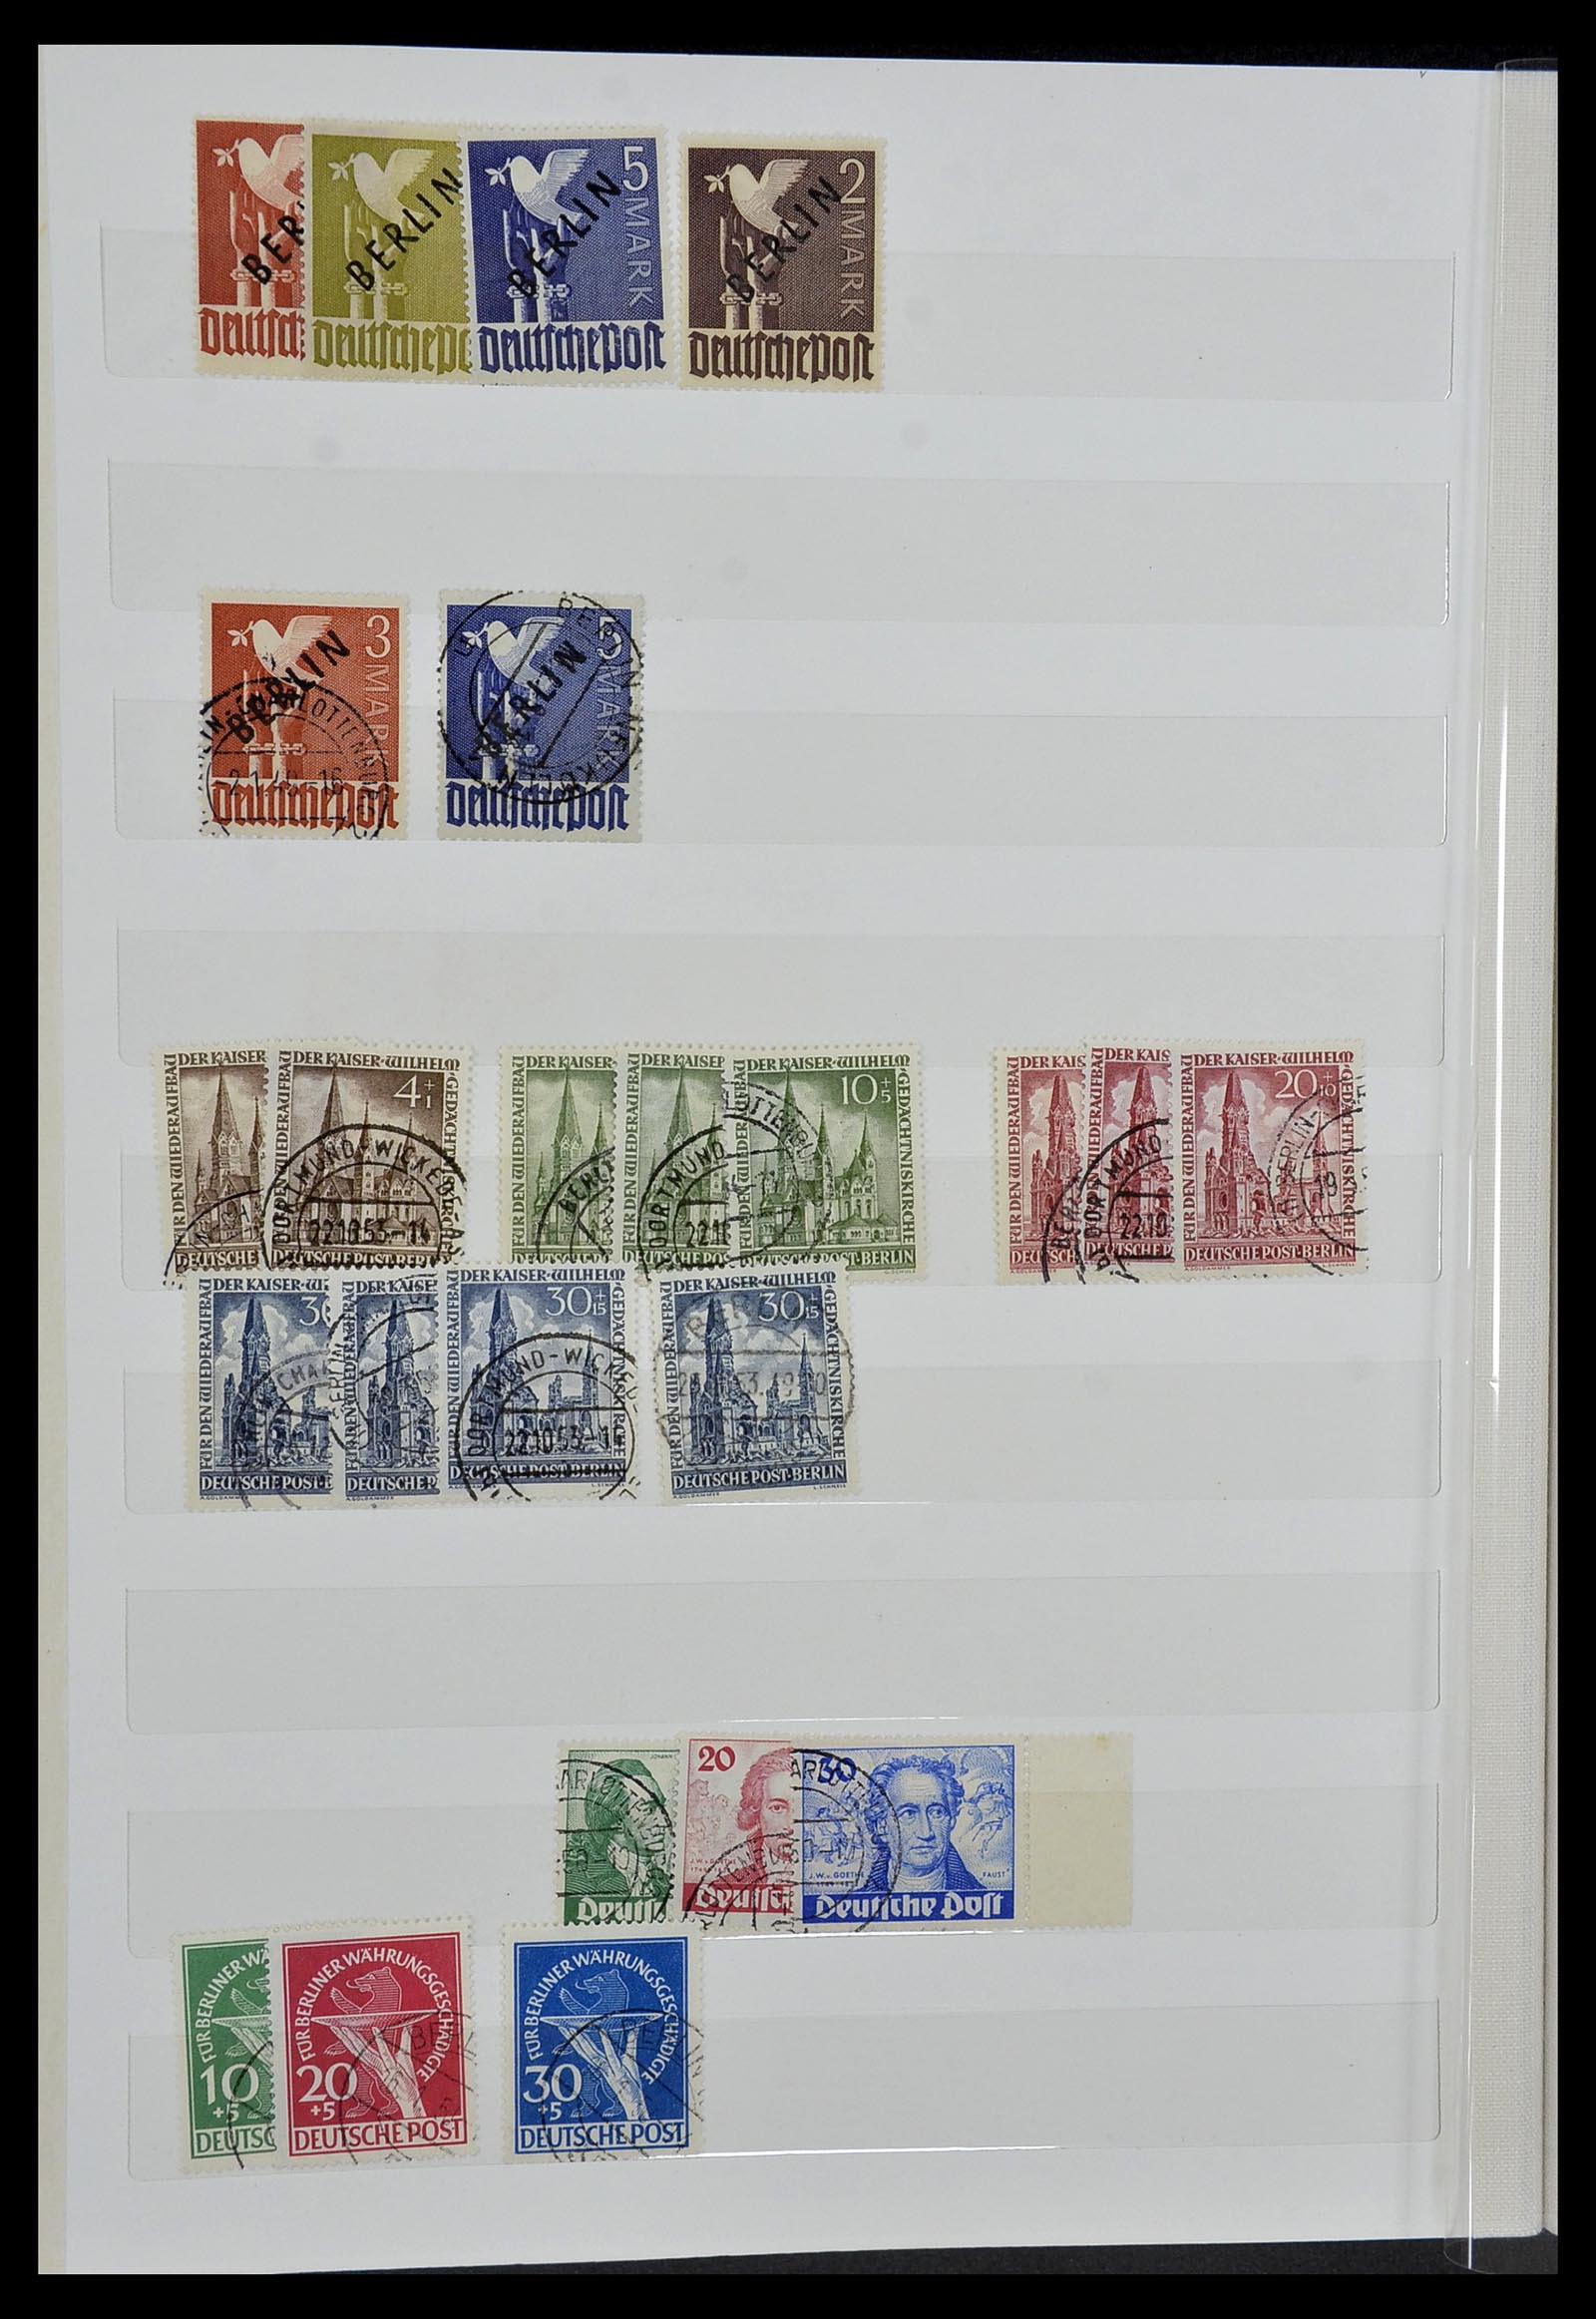 34069 009 - Postzegelverzameling 34069 Duitsland 1855-1952.